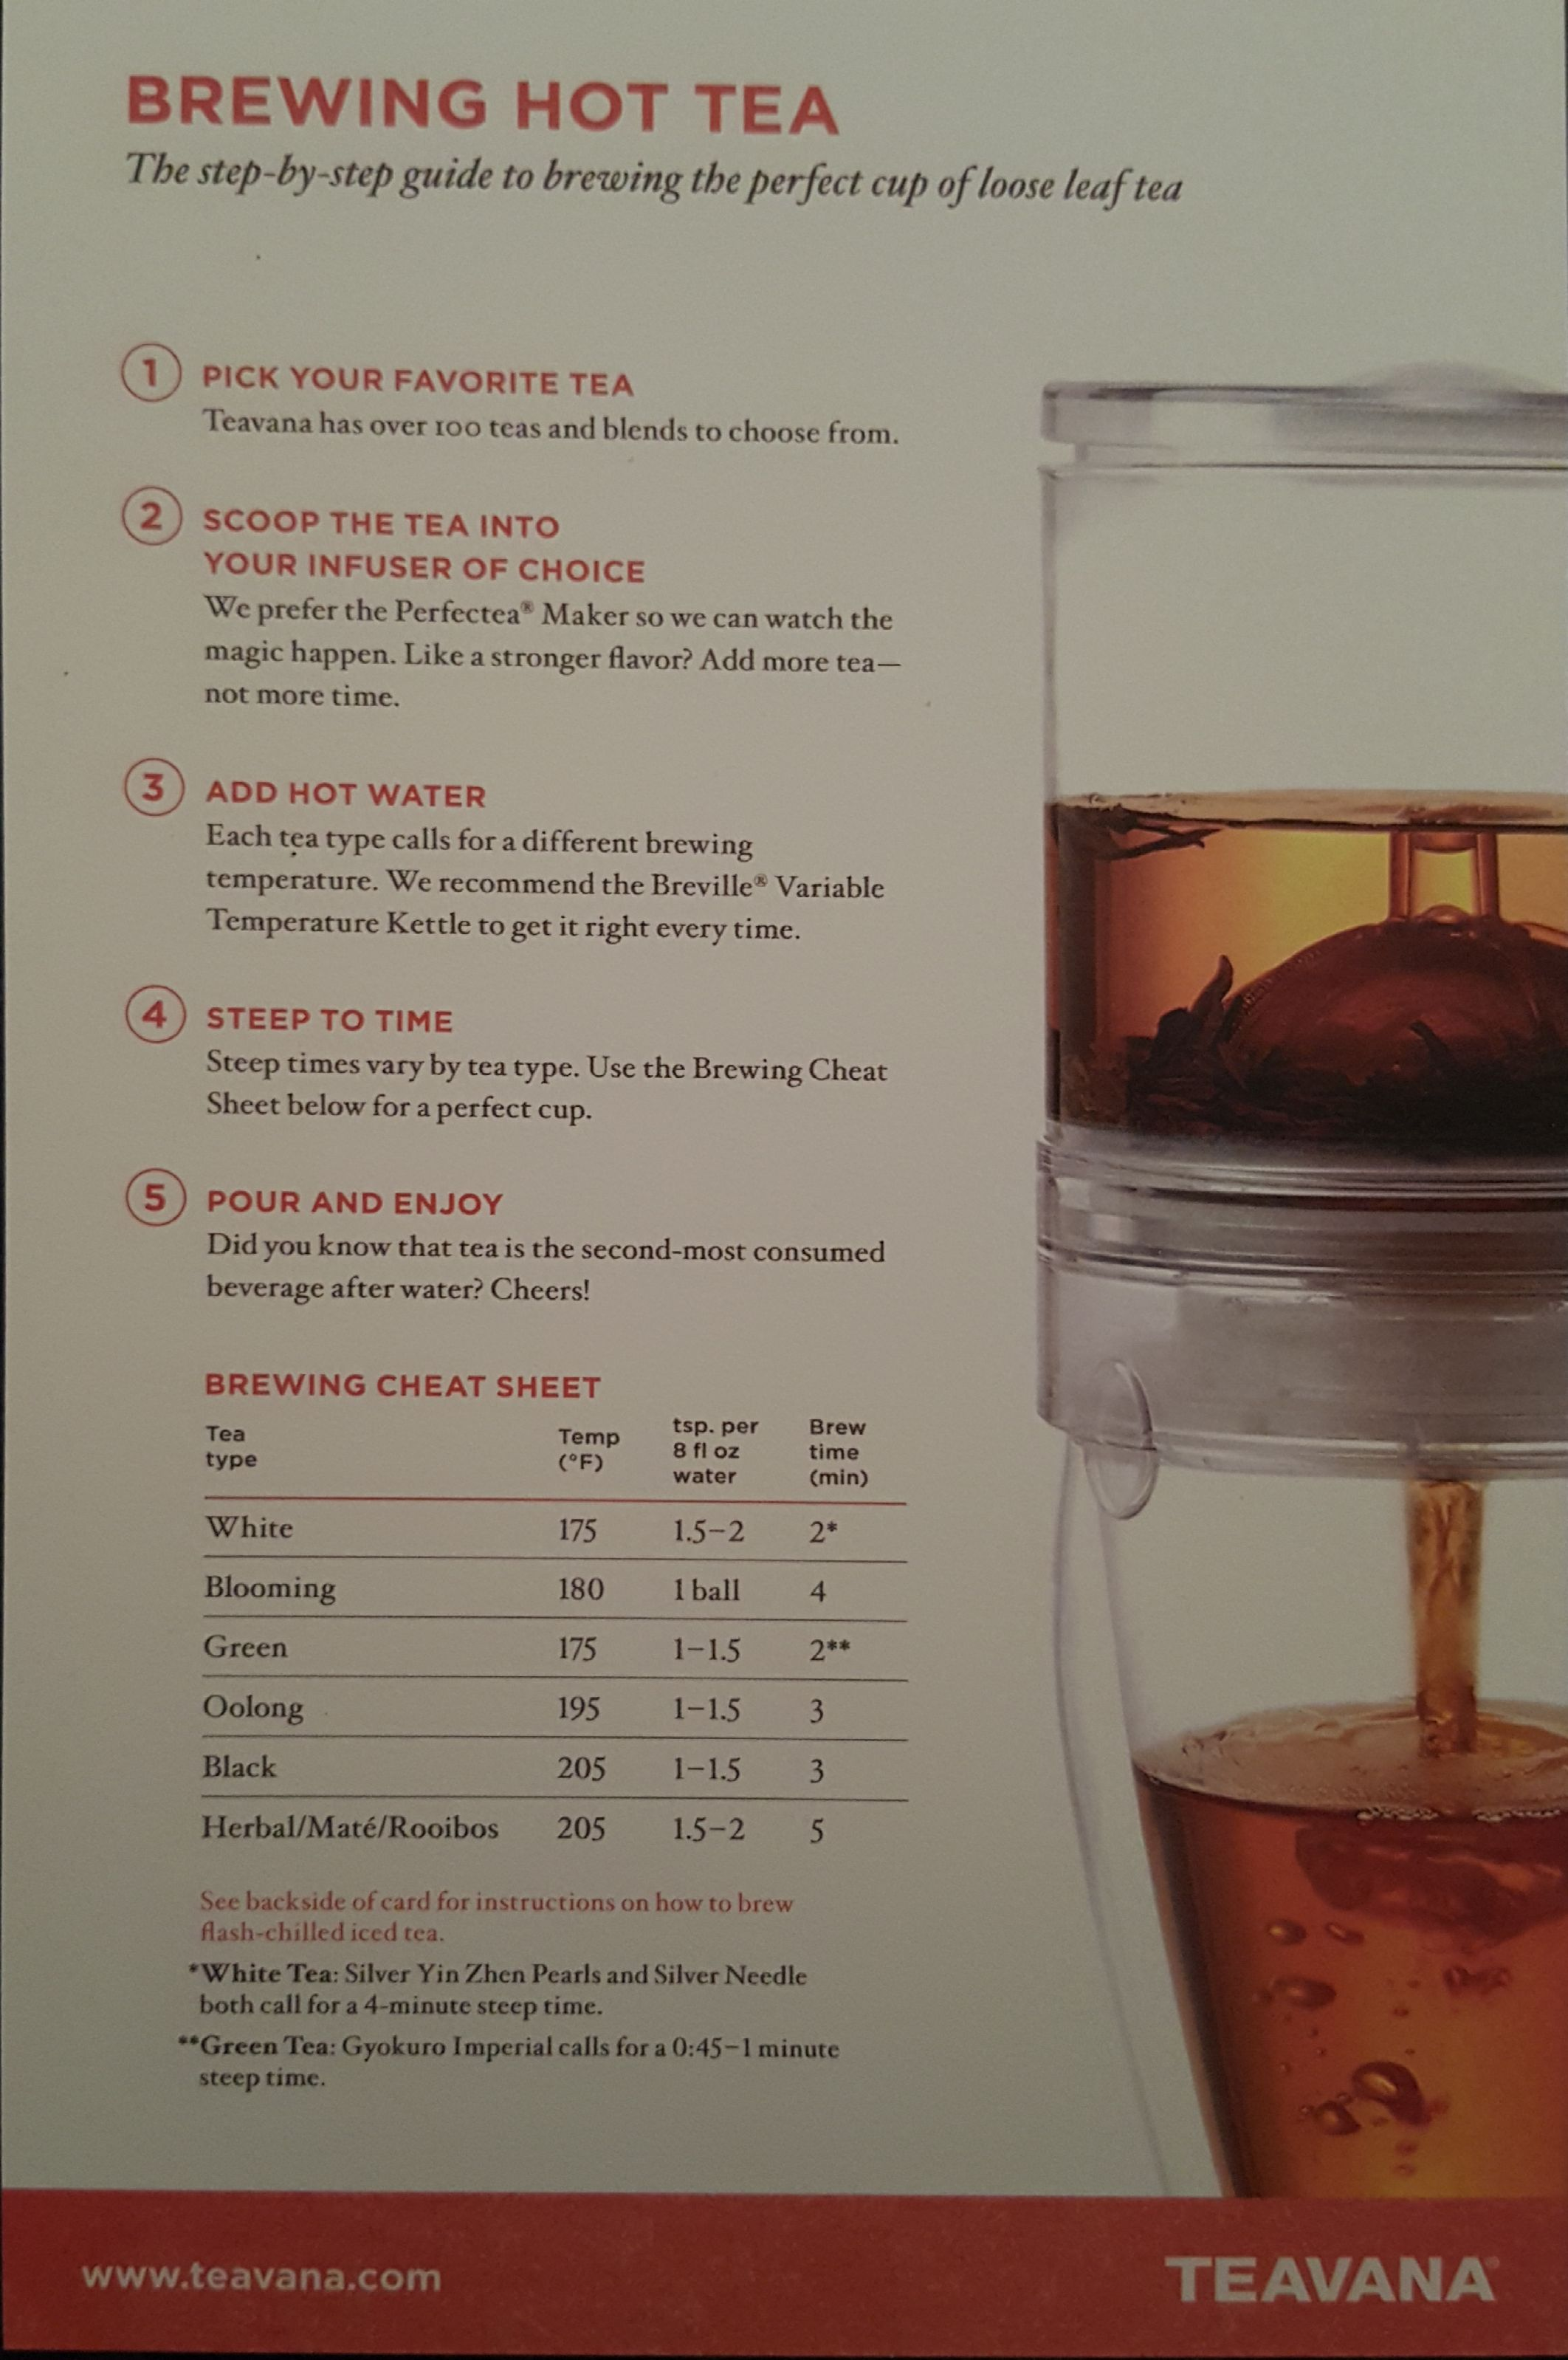 New Doc 48_1 brewing hot tea.jpg